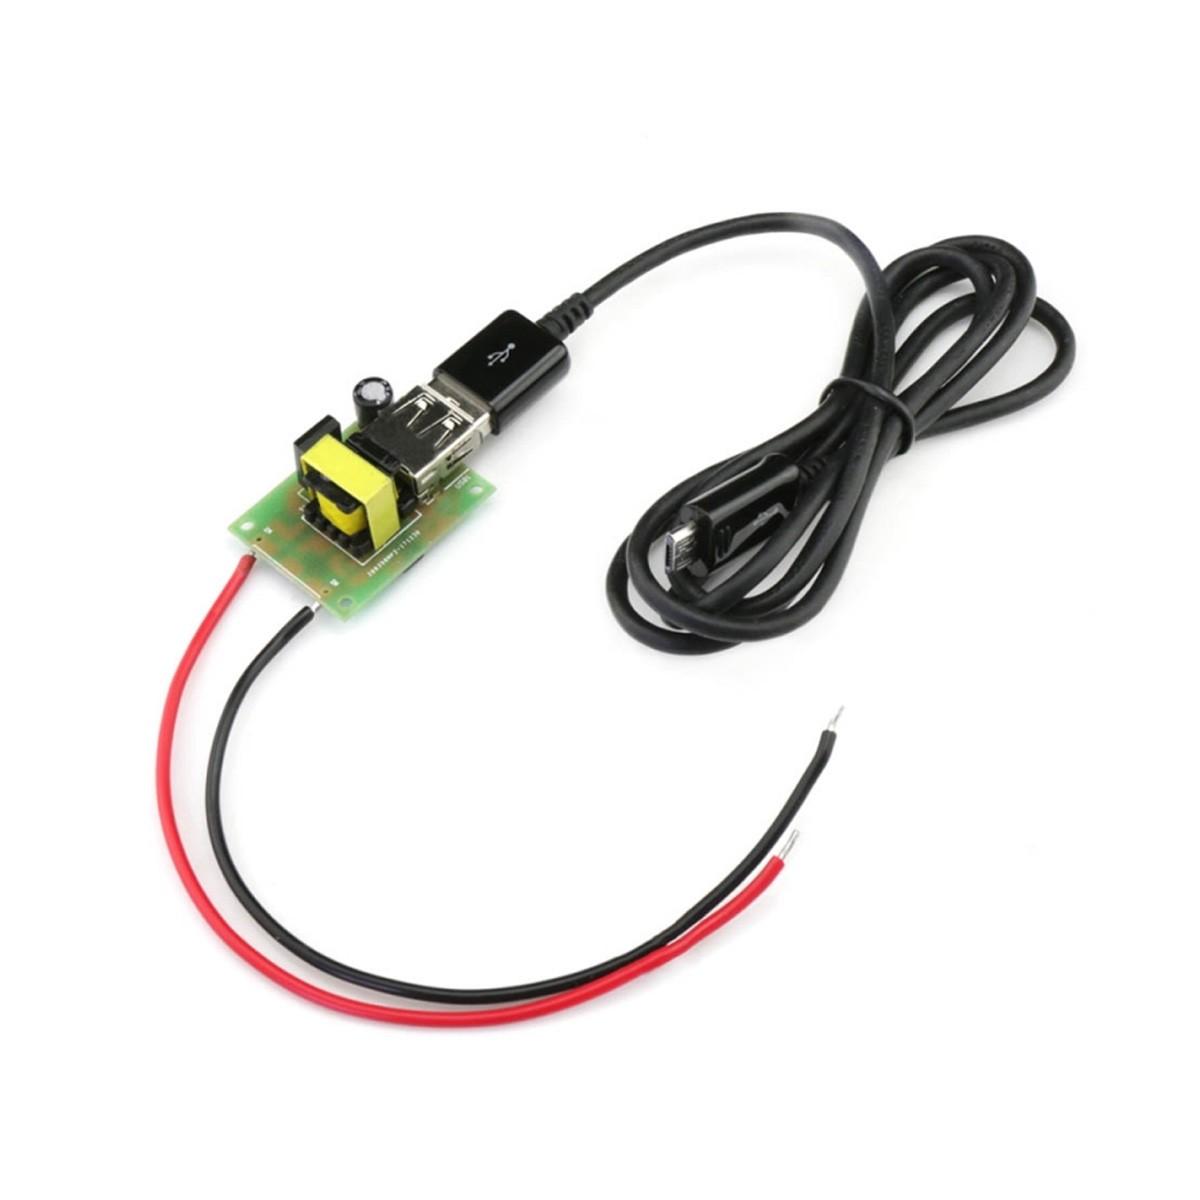 TINYSINE Adaptateur Convertisseur de Tension 12-80VDC vers 5VDC USB-A